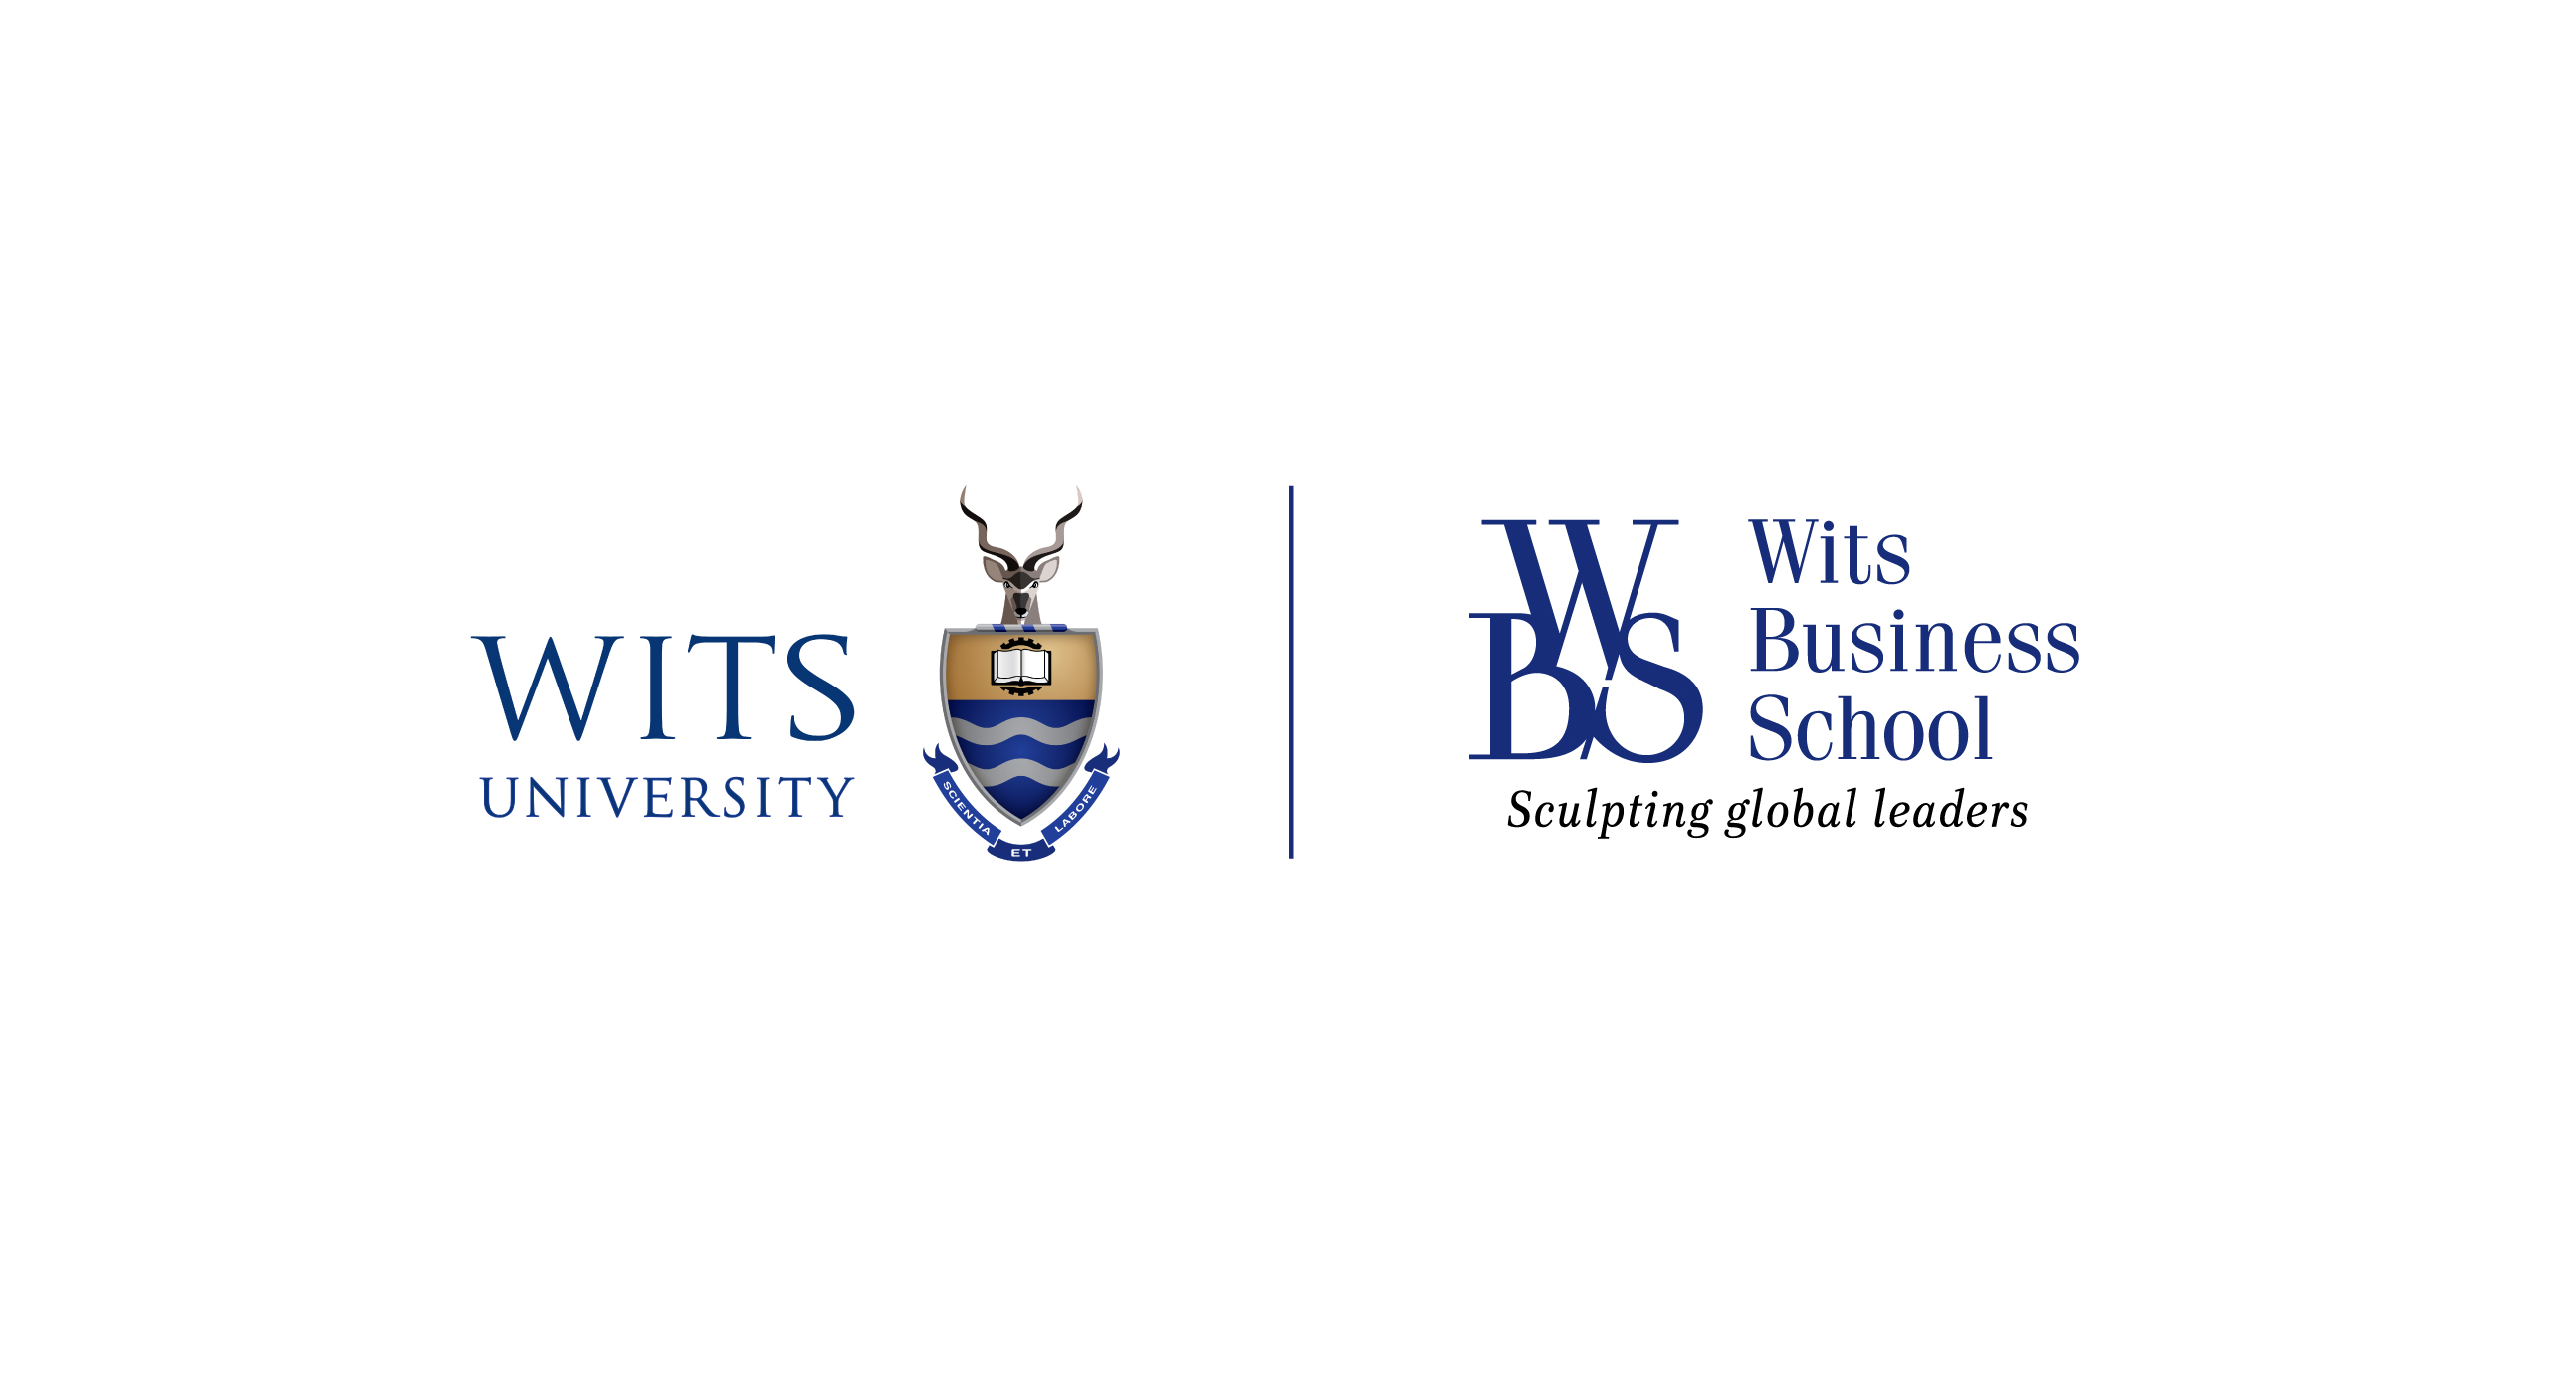 Wits Business School WBS logo